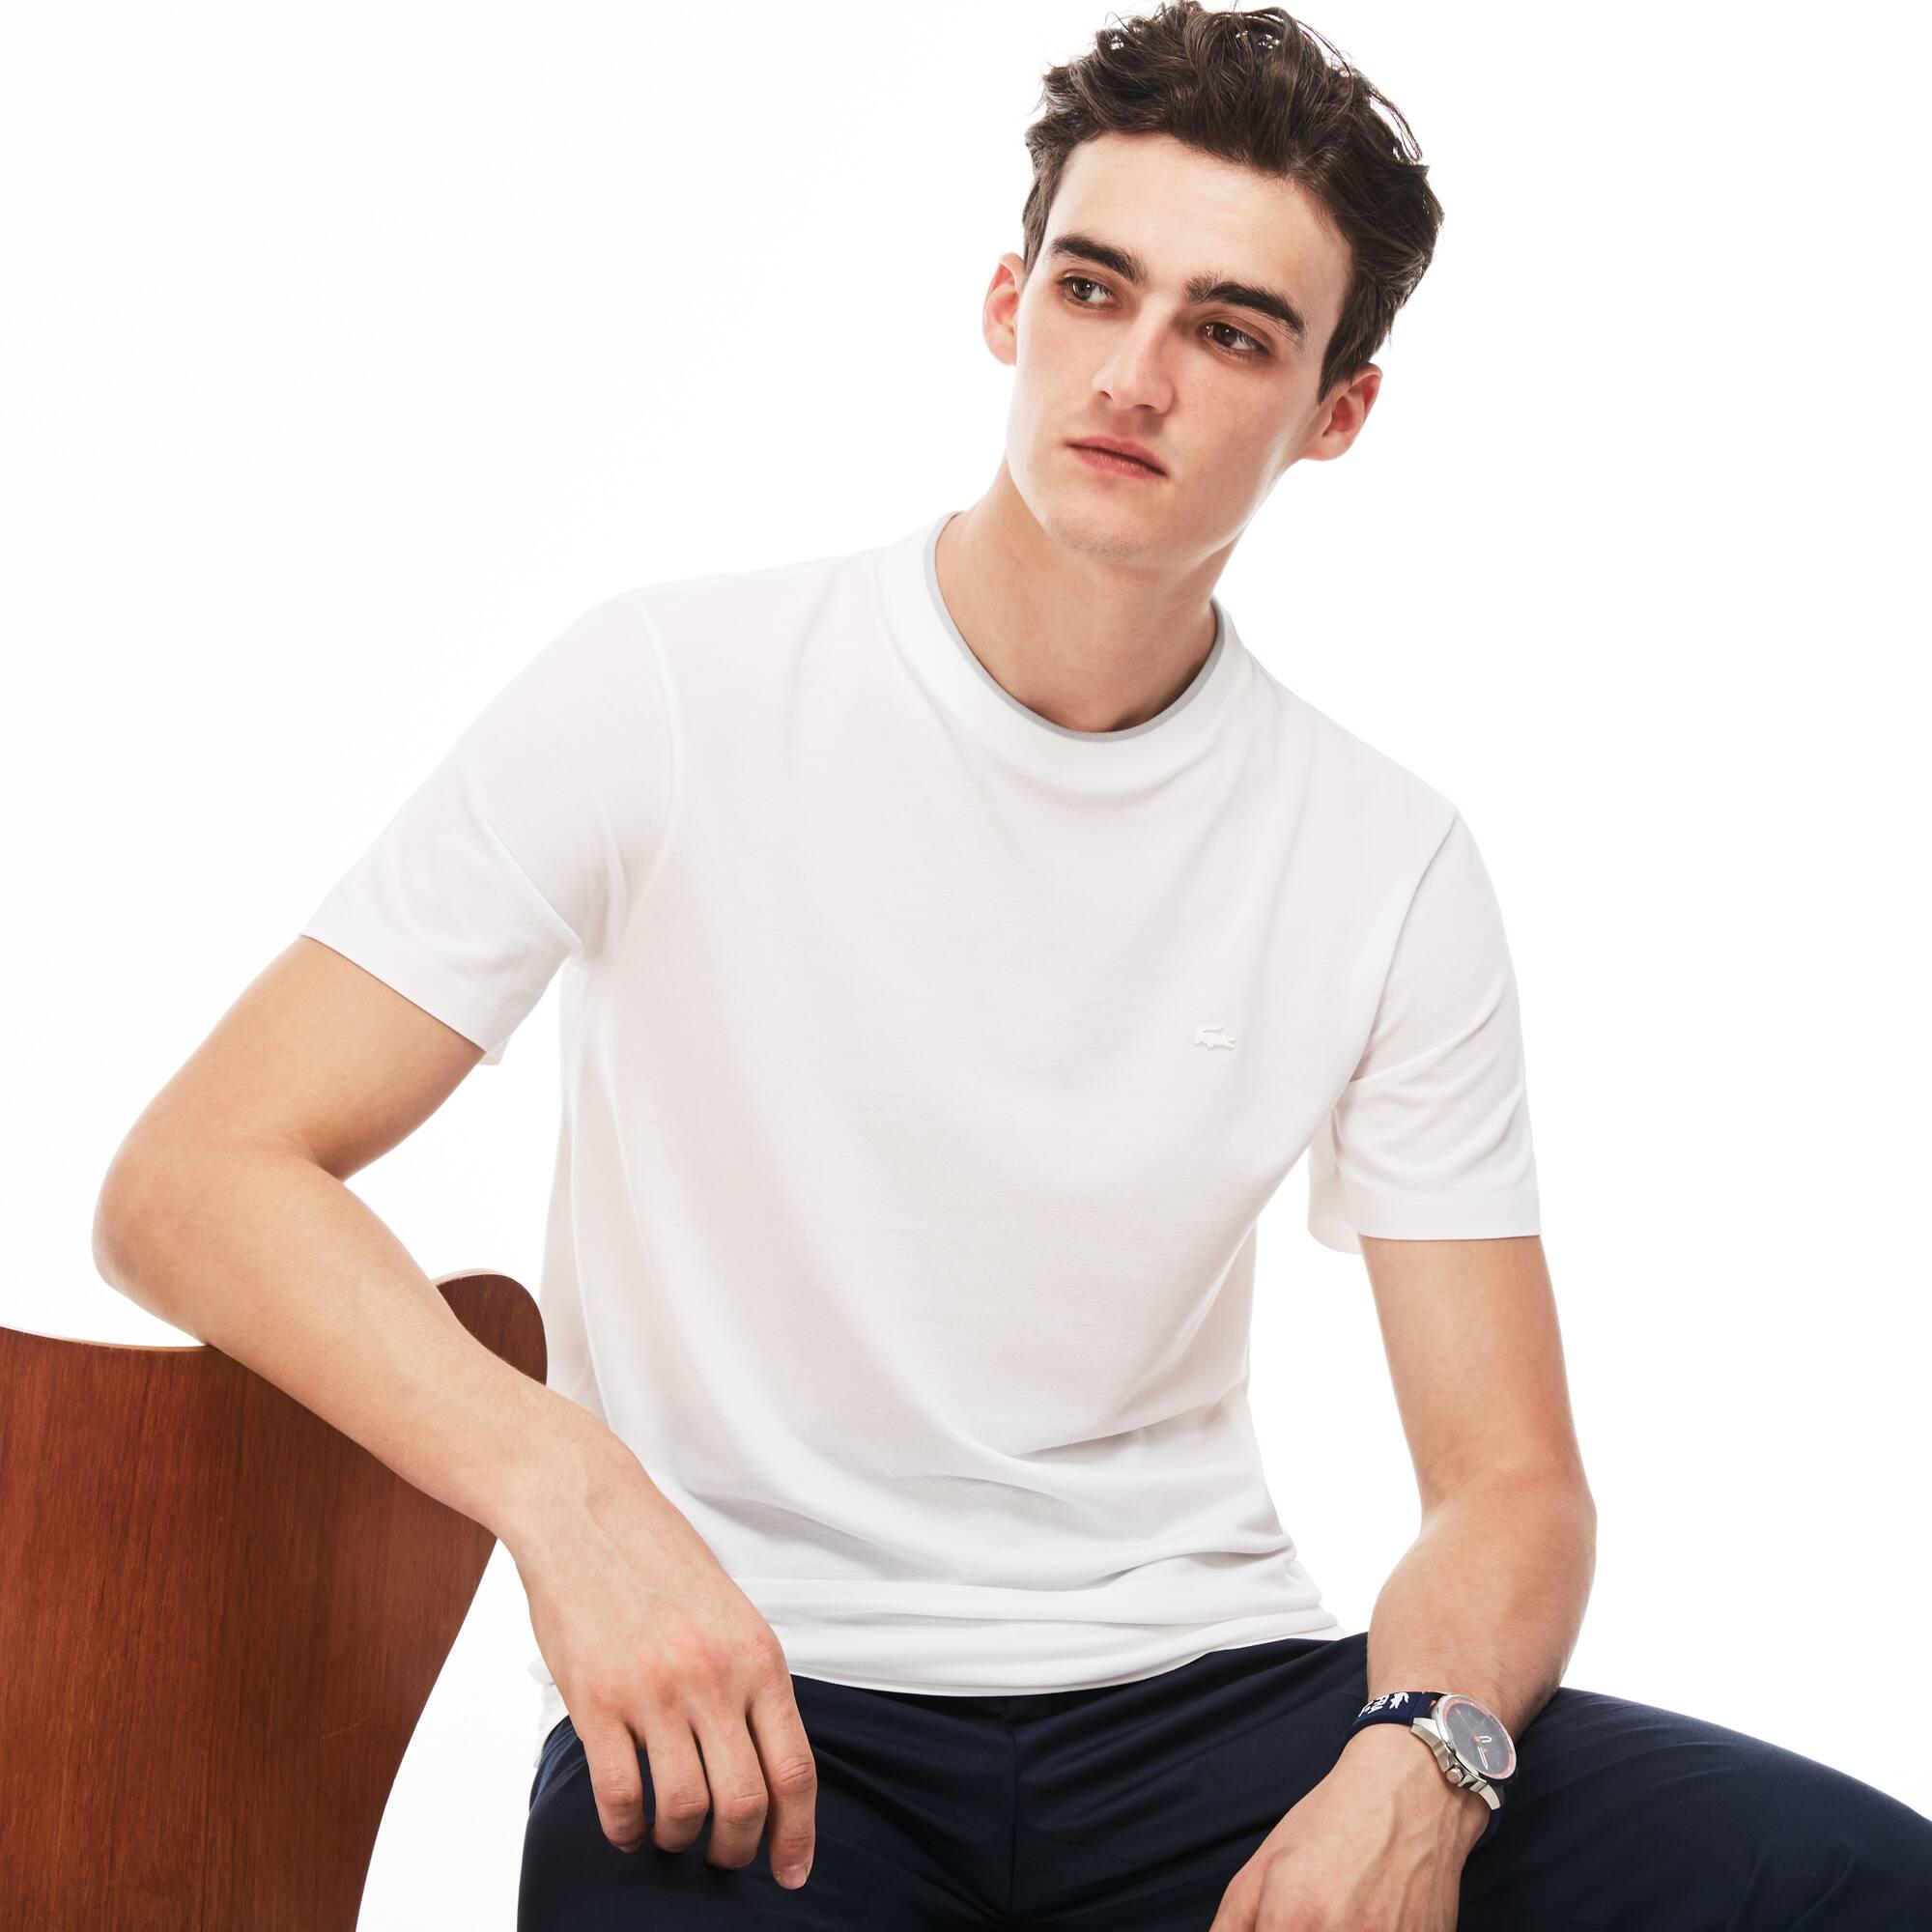 Camiseta de cuello redondo Lacoste MOTION de punto de piqué de algodón Pima liso